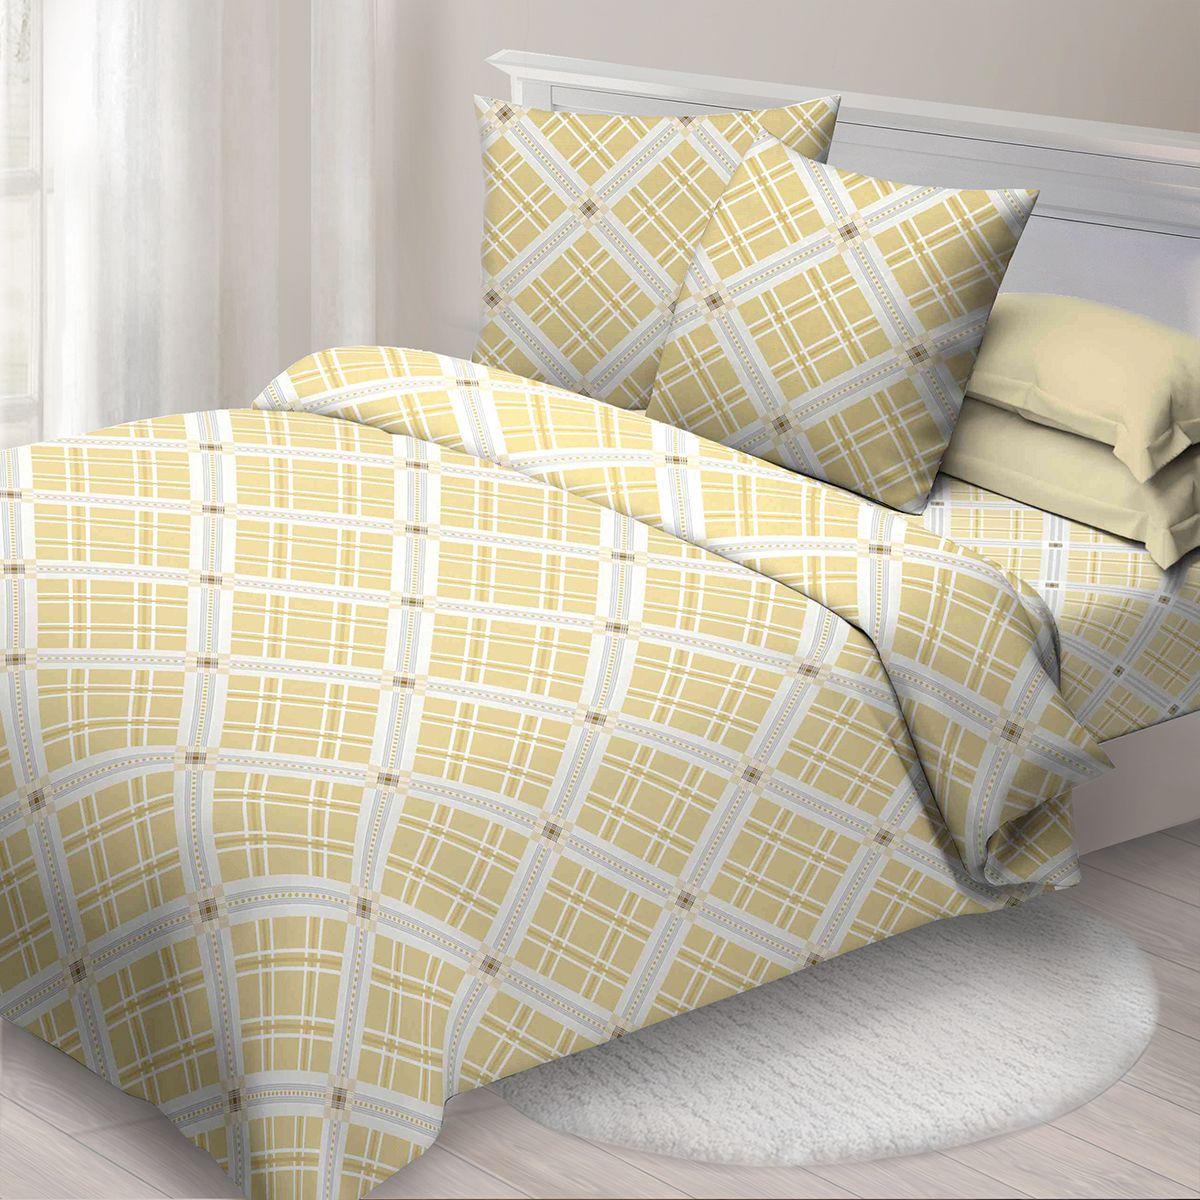 Комплект белья Спал Спалыч Ромбы, 2-х спальное, наволочки 70x70, цвет: бежевый. 4090-185081